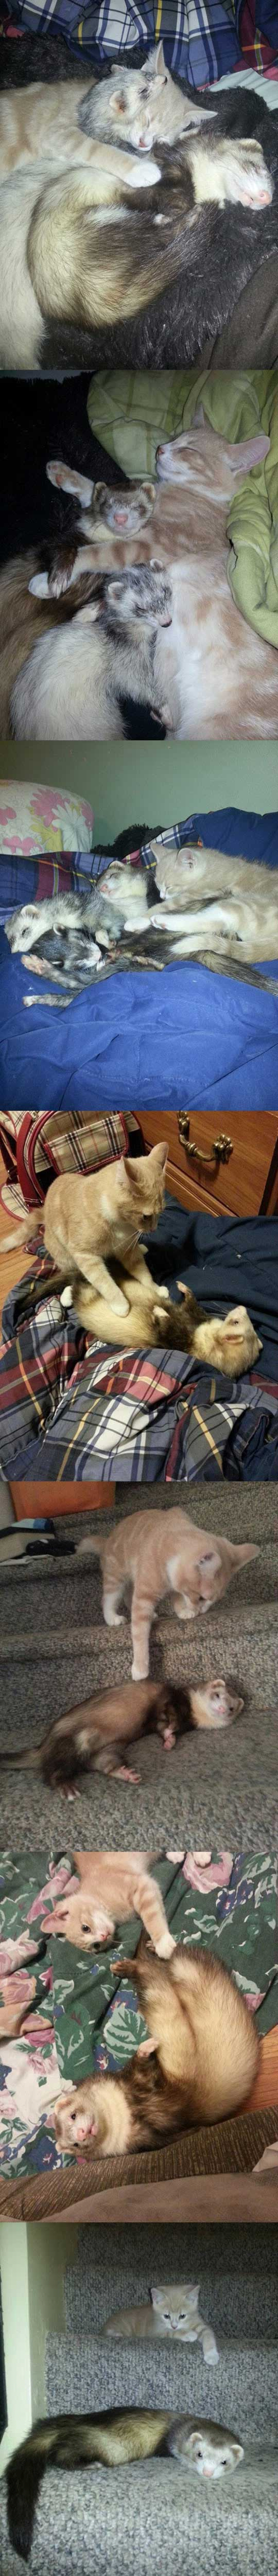 I had a Crazy Ferrat home. Then I brought a New cat home. Watch How My Ferrat Reacted